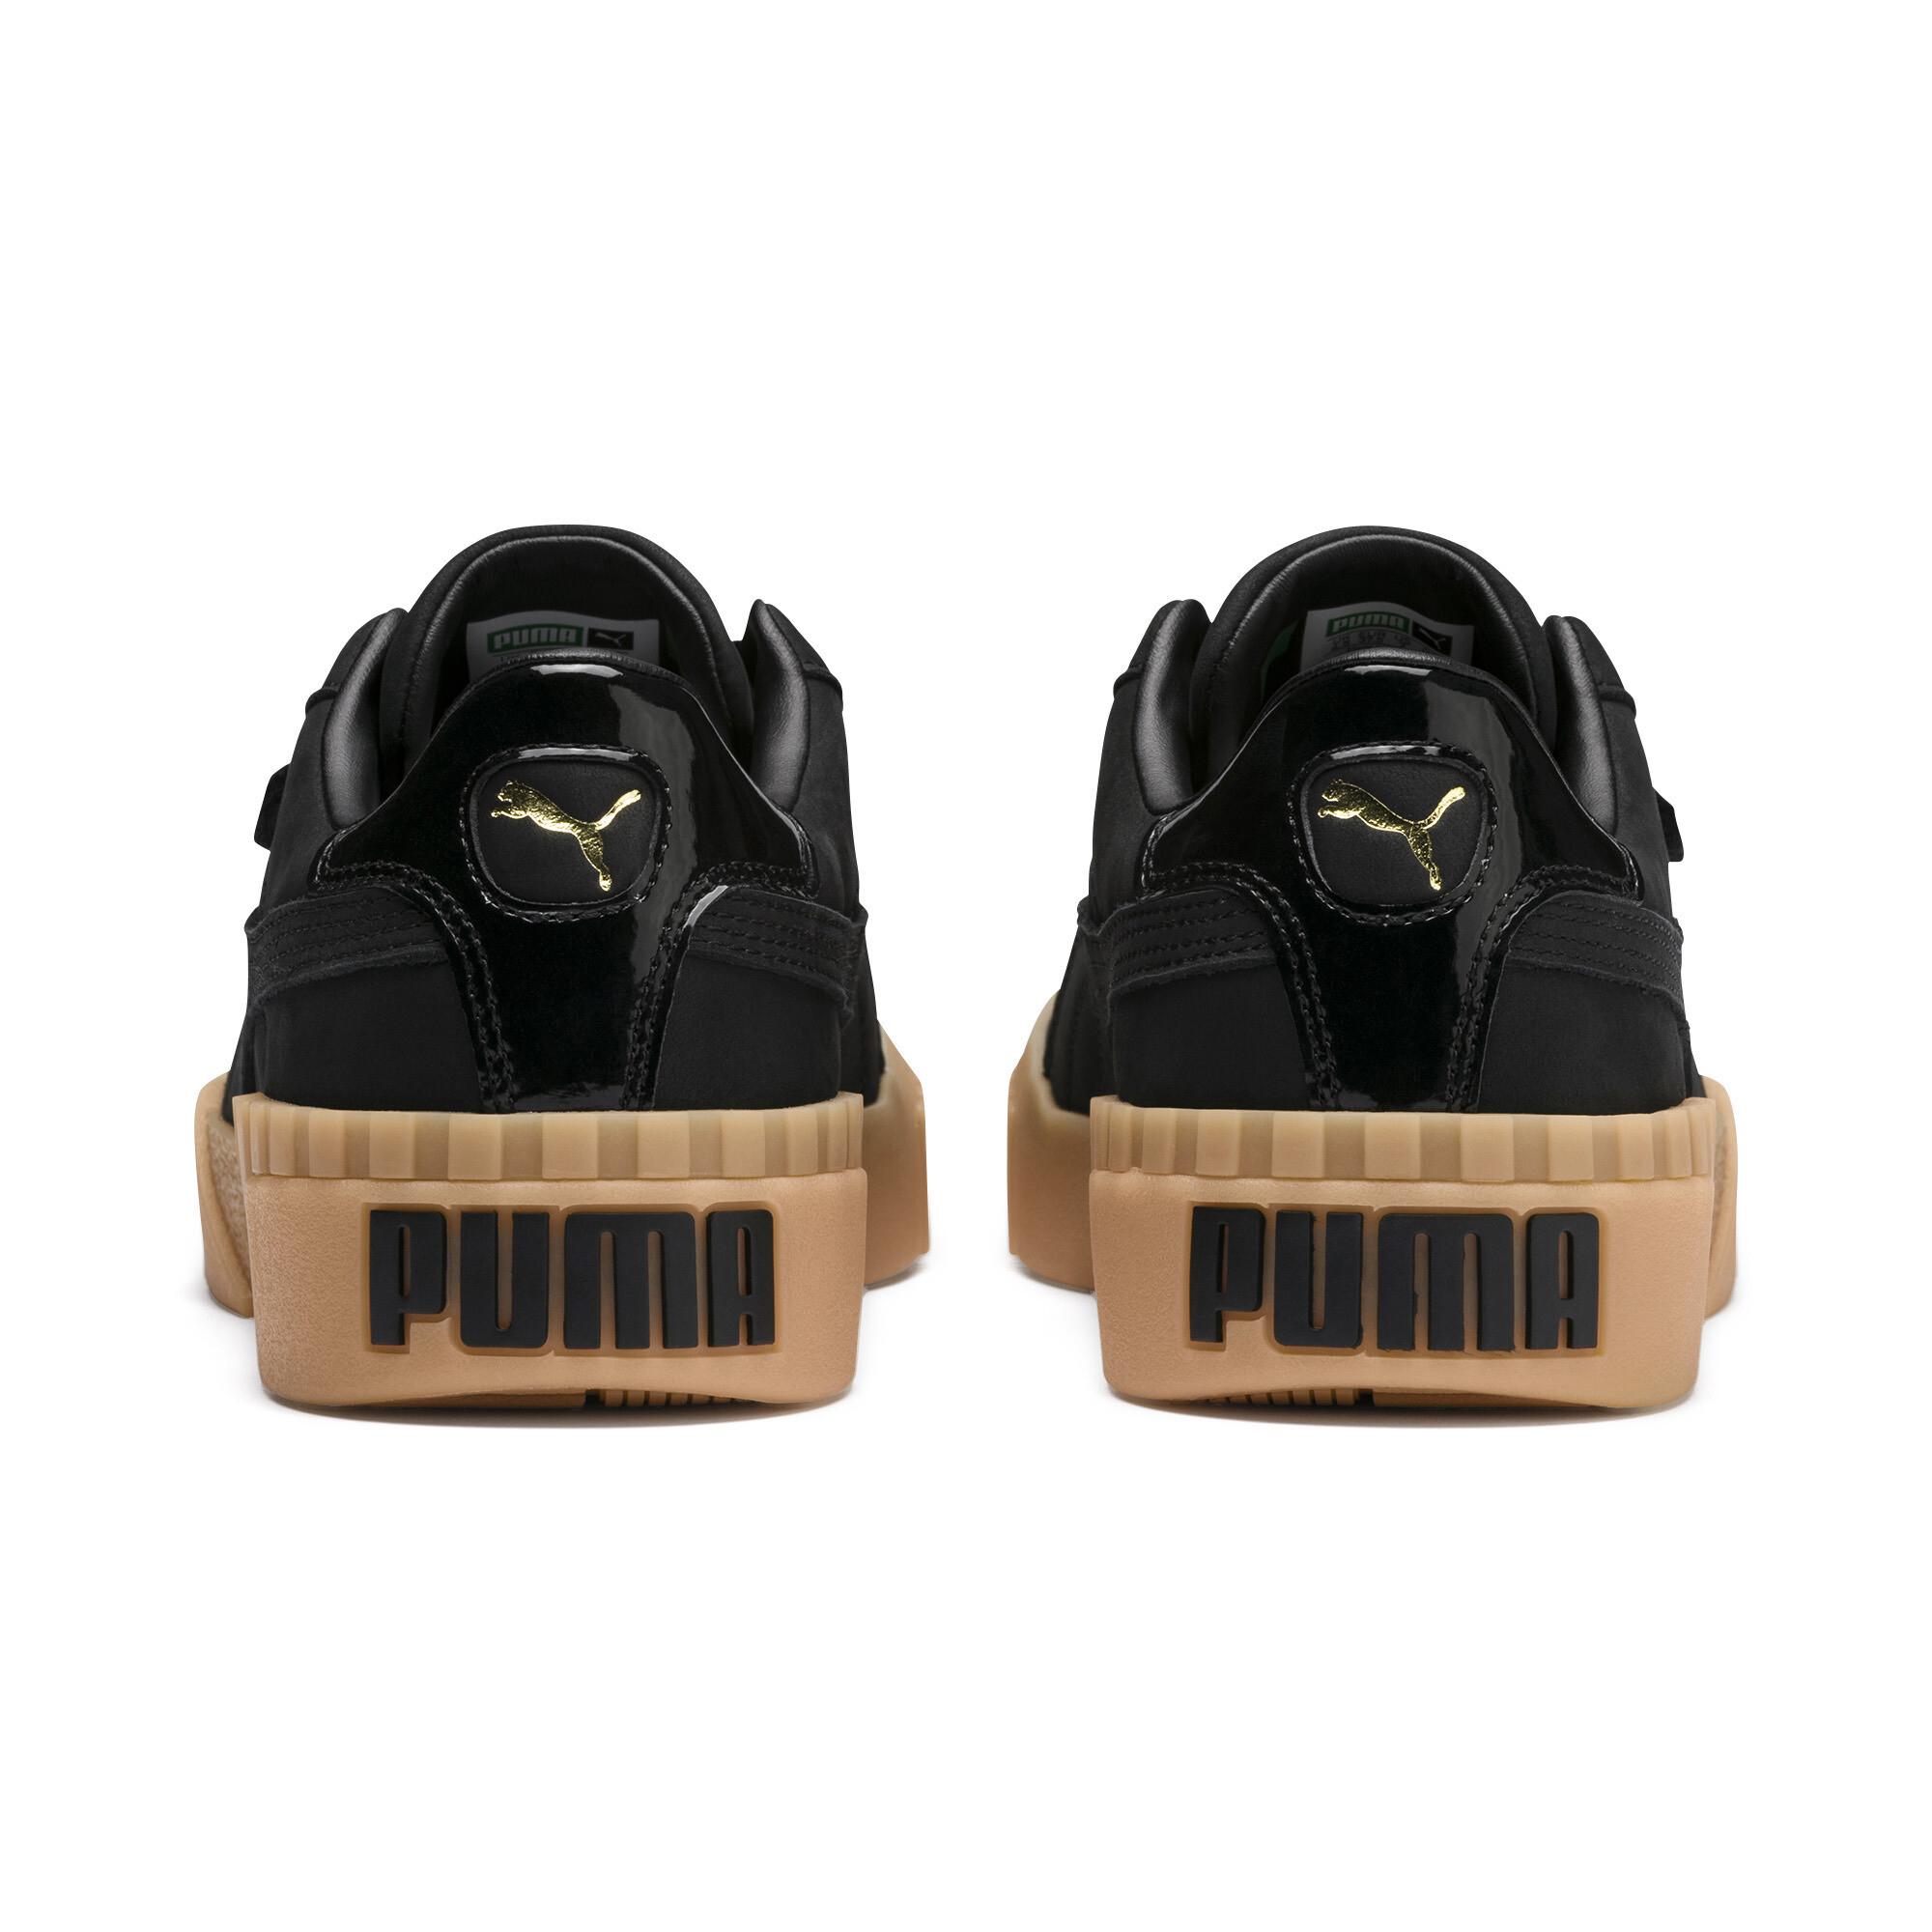 Image Puma Cali Nubuck Women's Sneakers #4